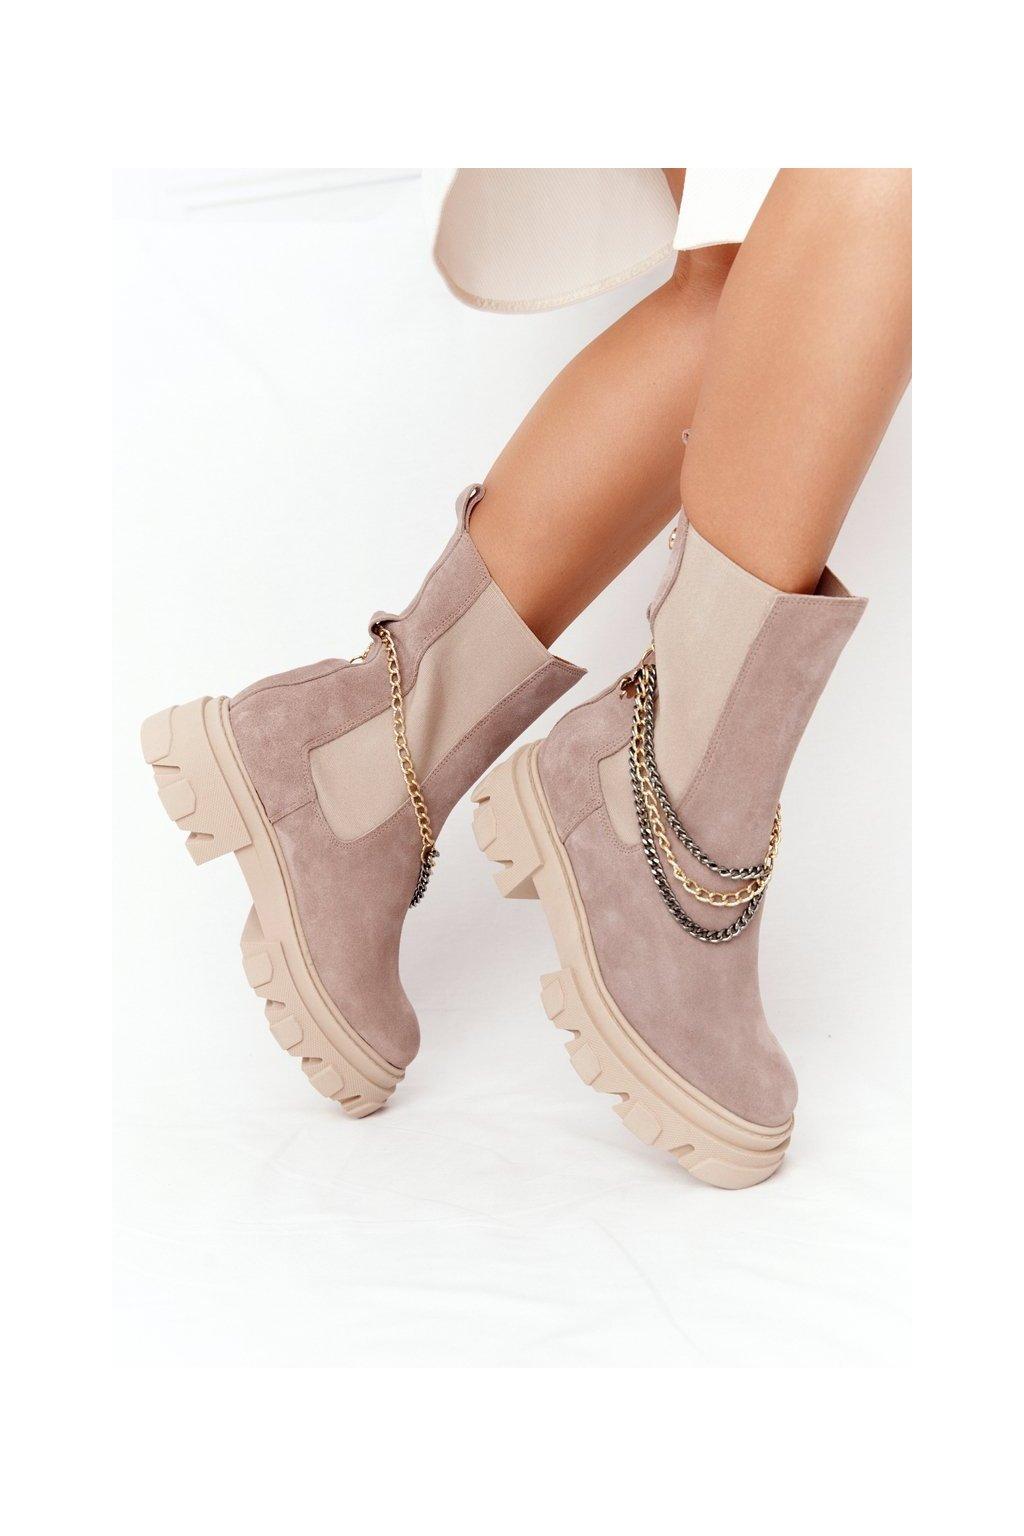 Členkové topánky na podpätku farba hnedá kód obuvi 2998-0 BEŻ WELUR